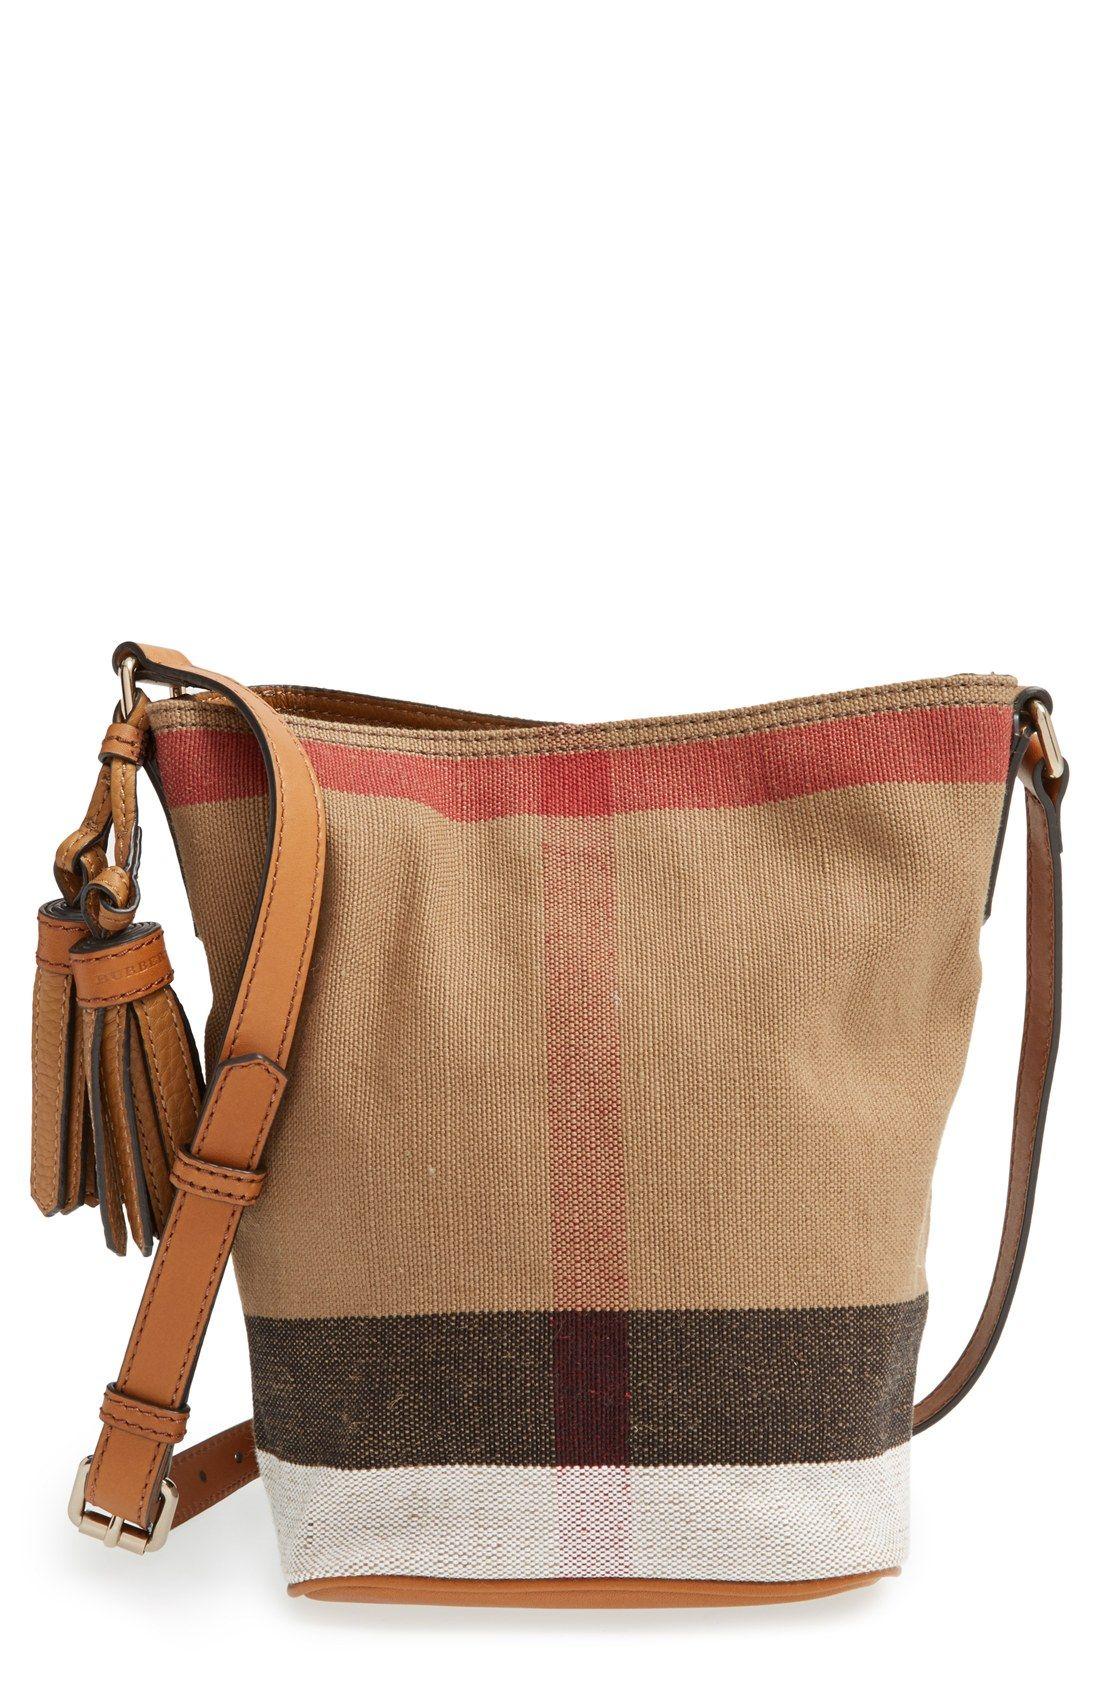 87a5b5f9892c Burberry Brit  Mini Ashby  Canvas Check Crossbody Bucket Bag ...